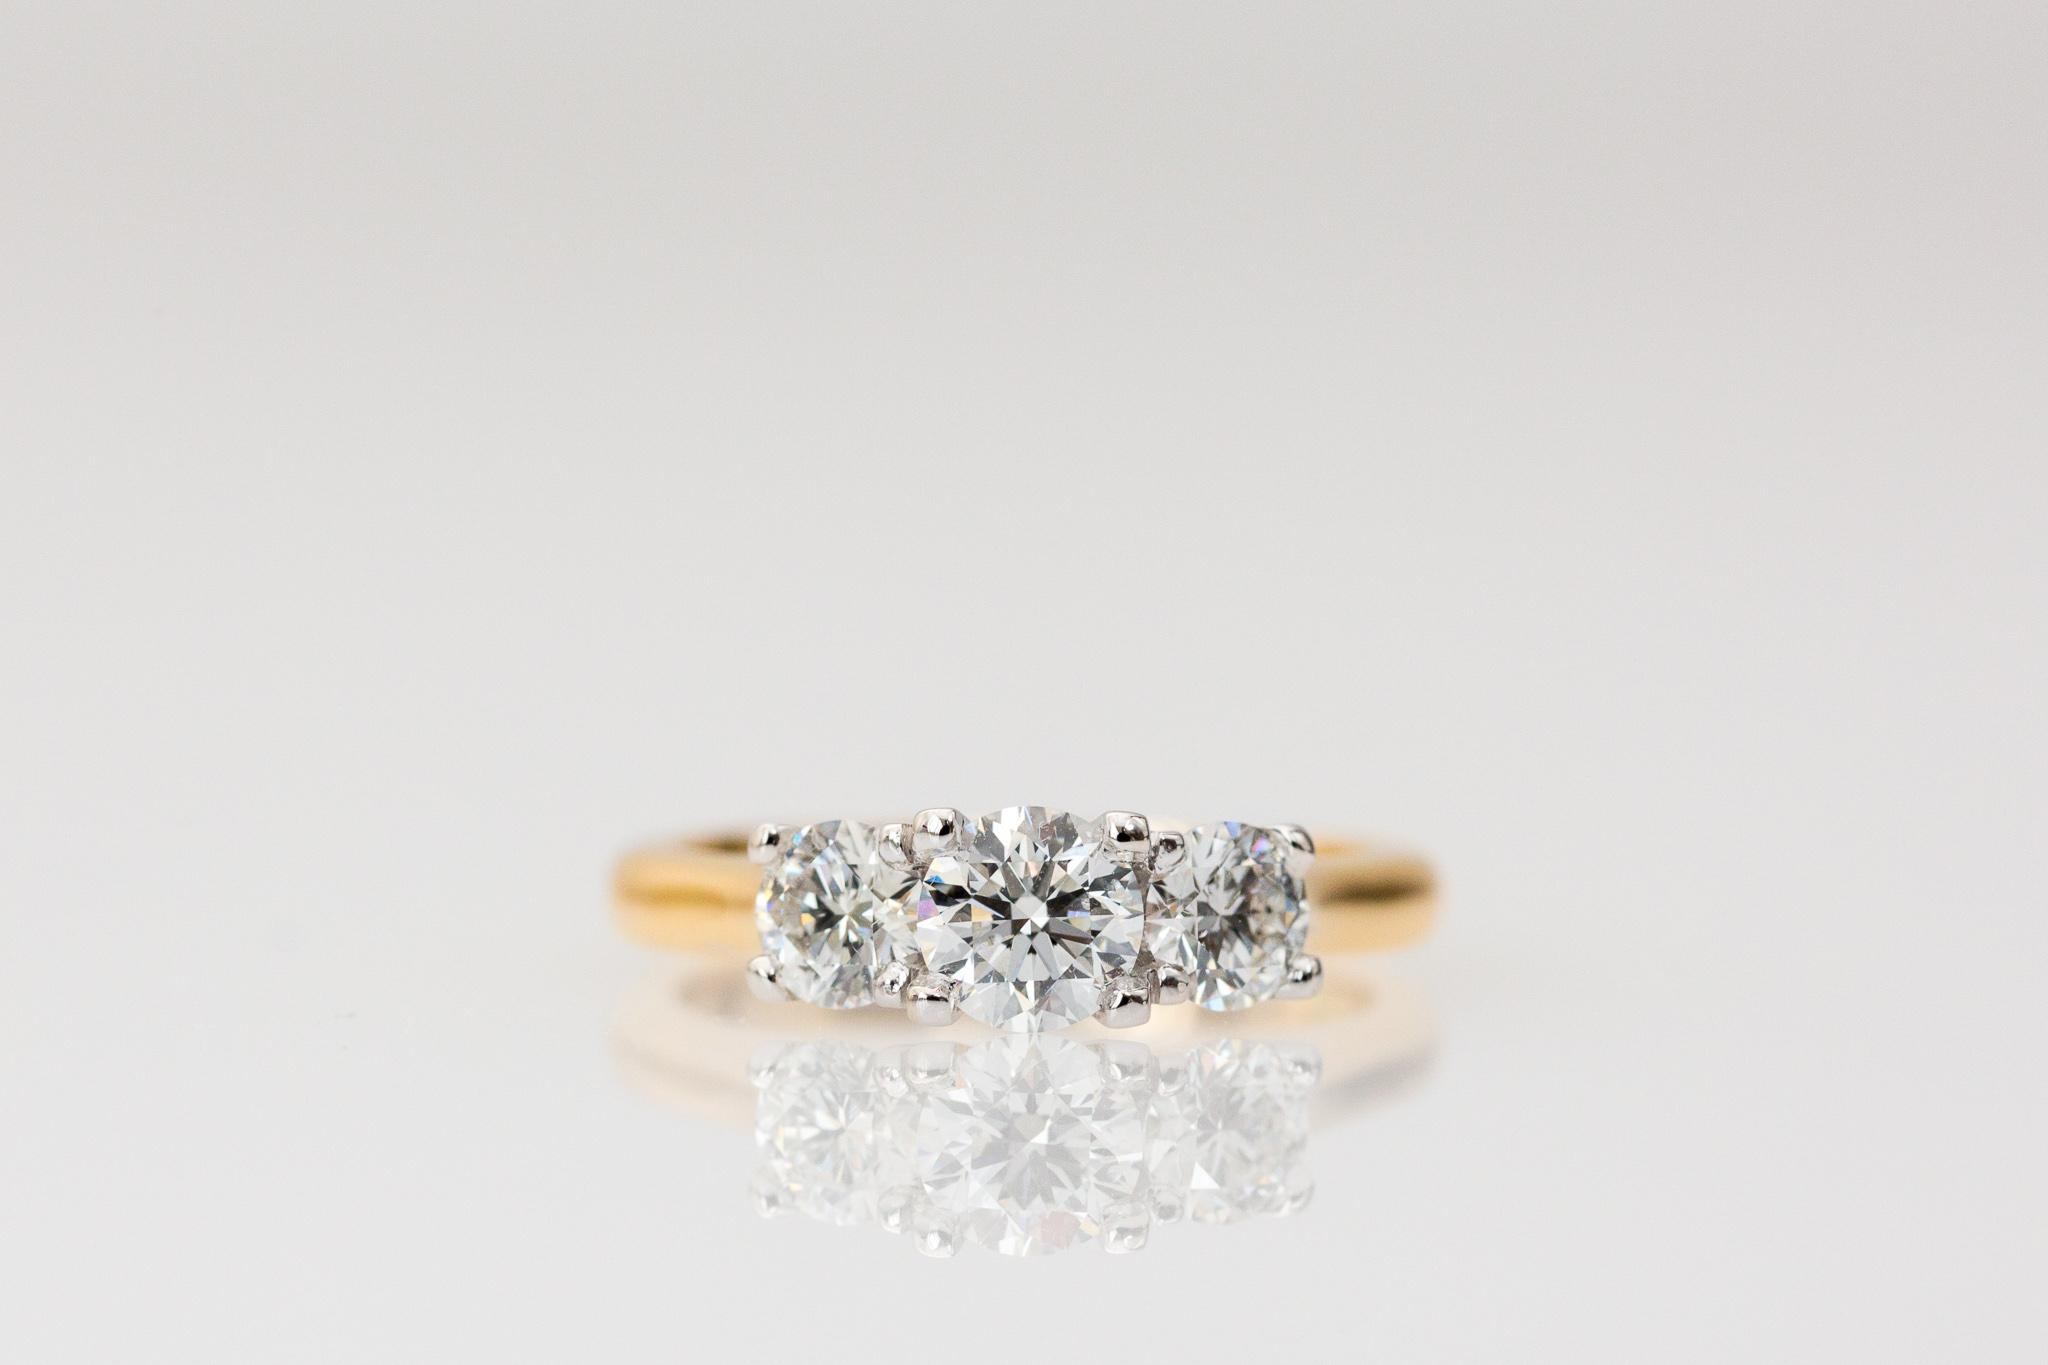 Yellow gold three stone engagement ring.